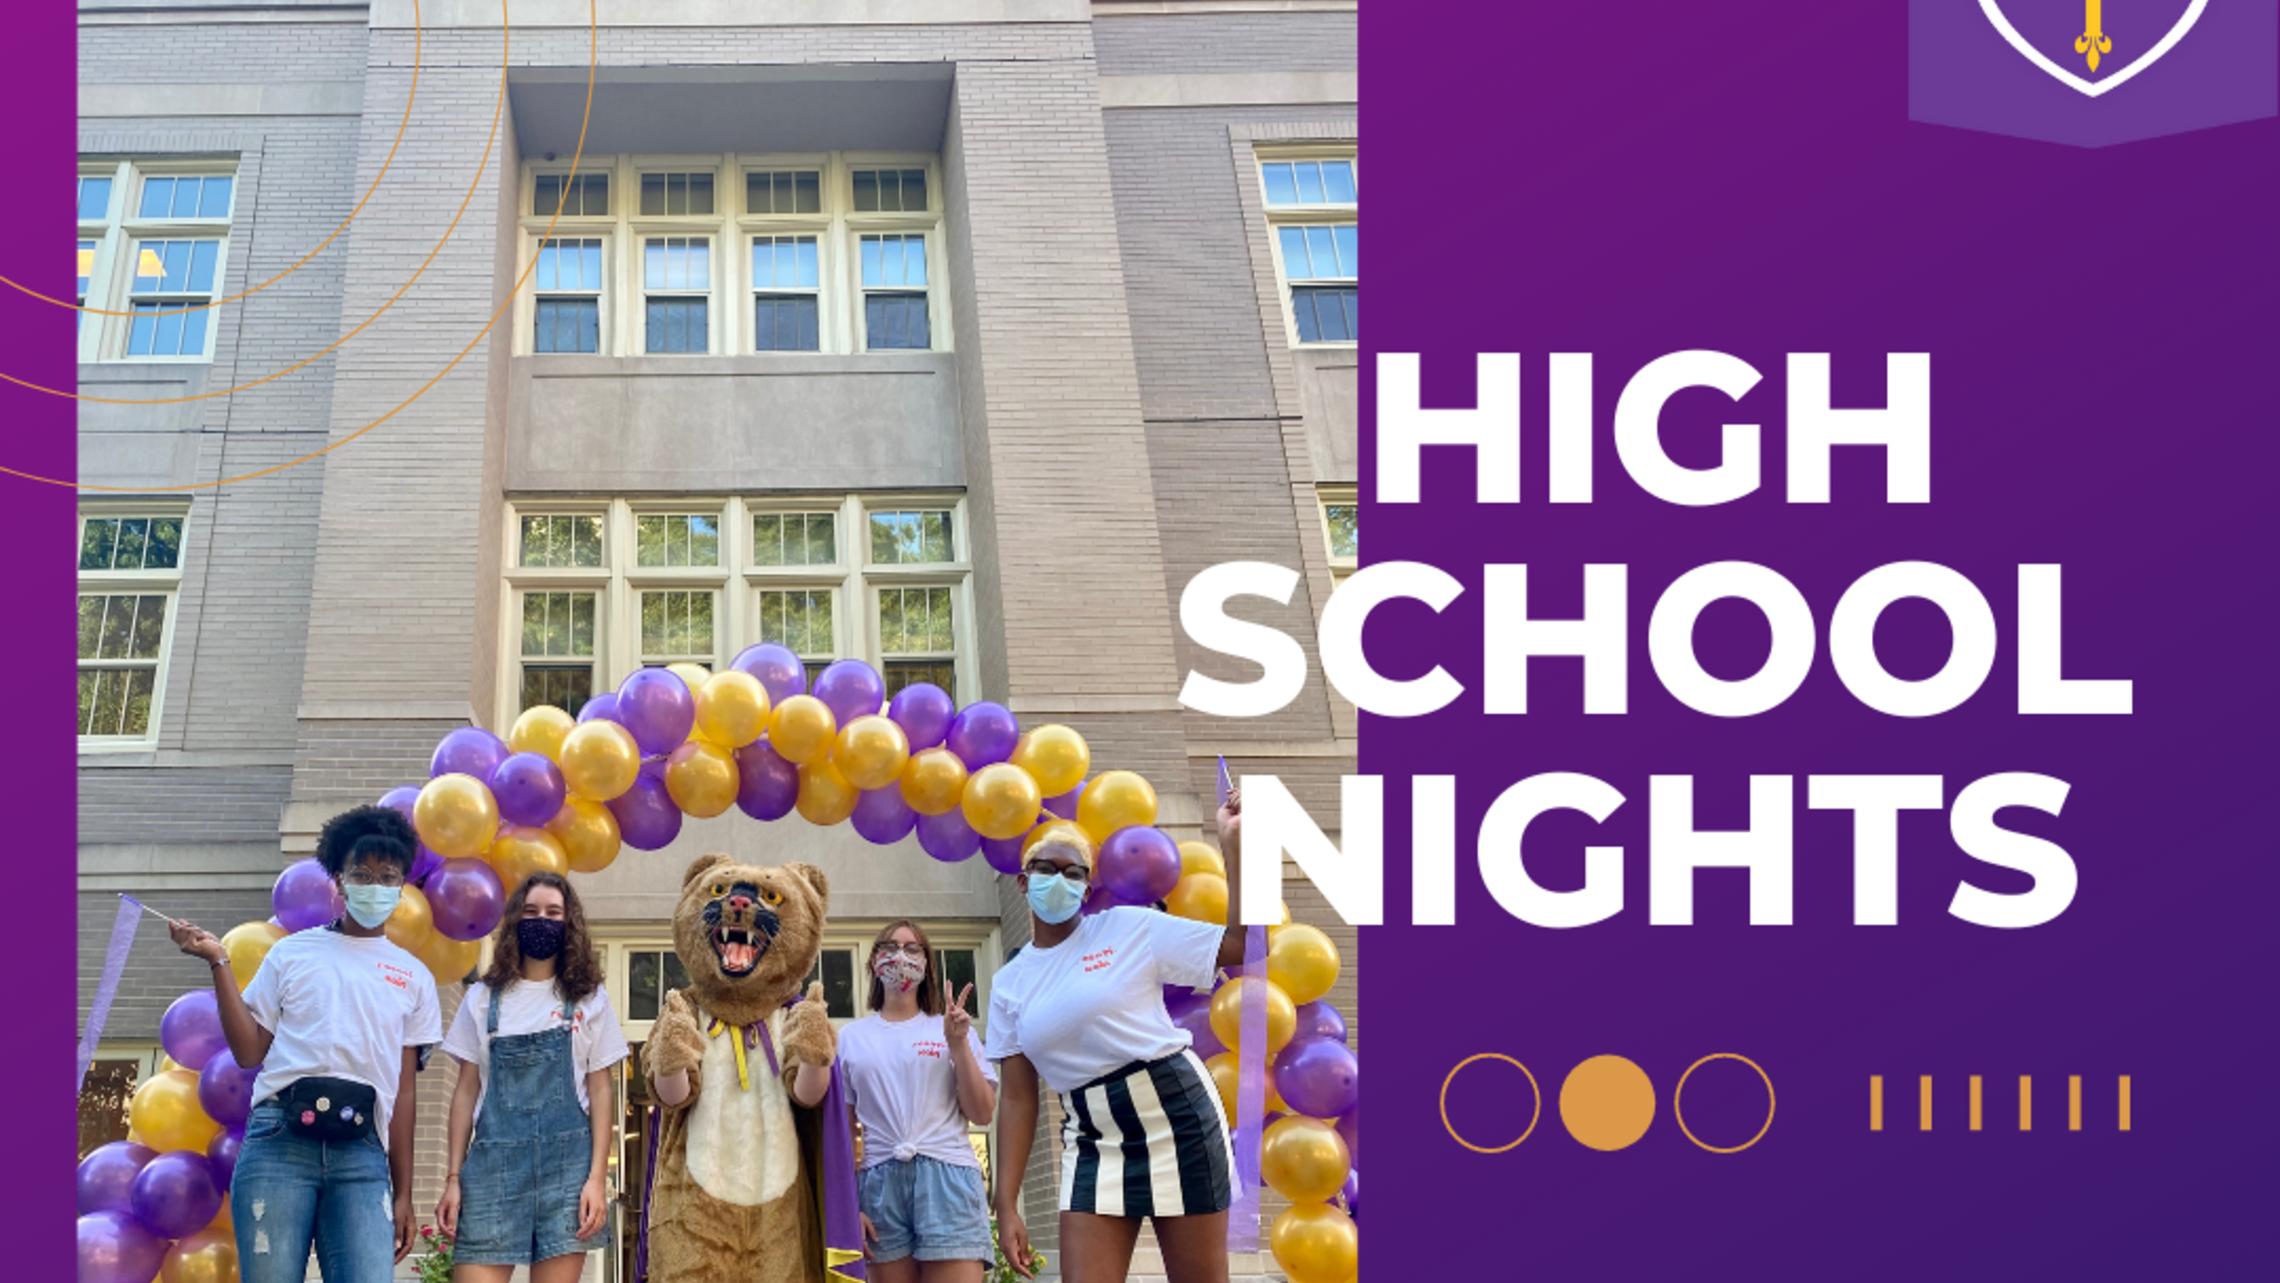 High School Night Image